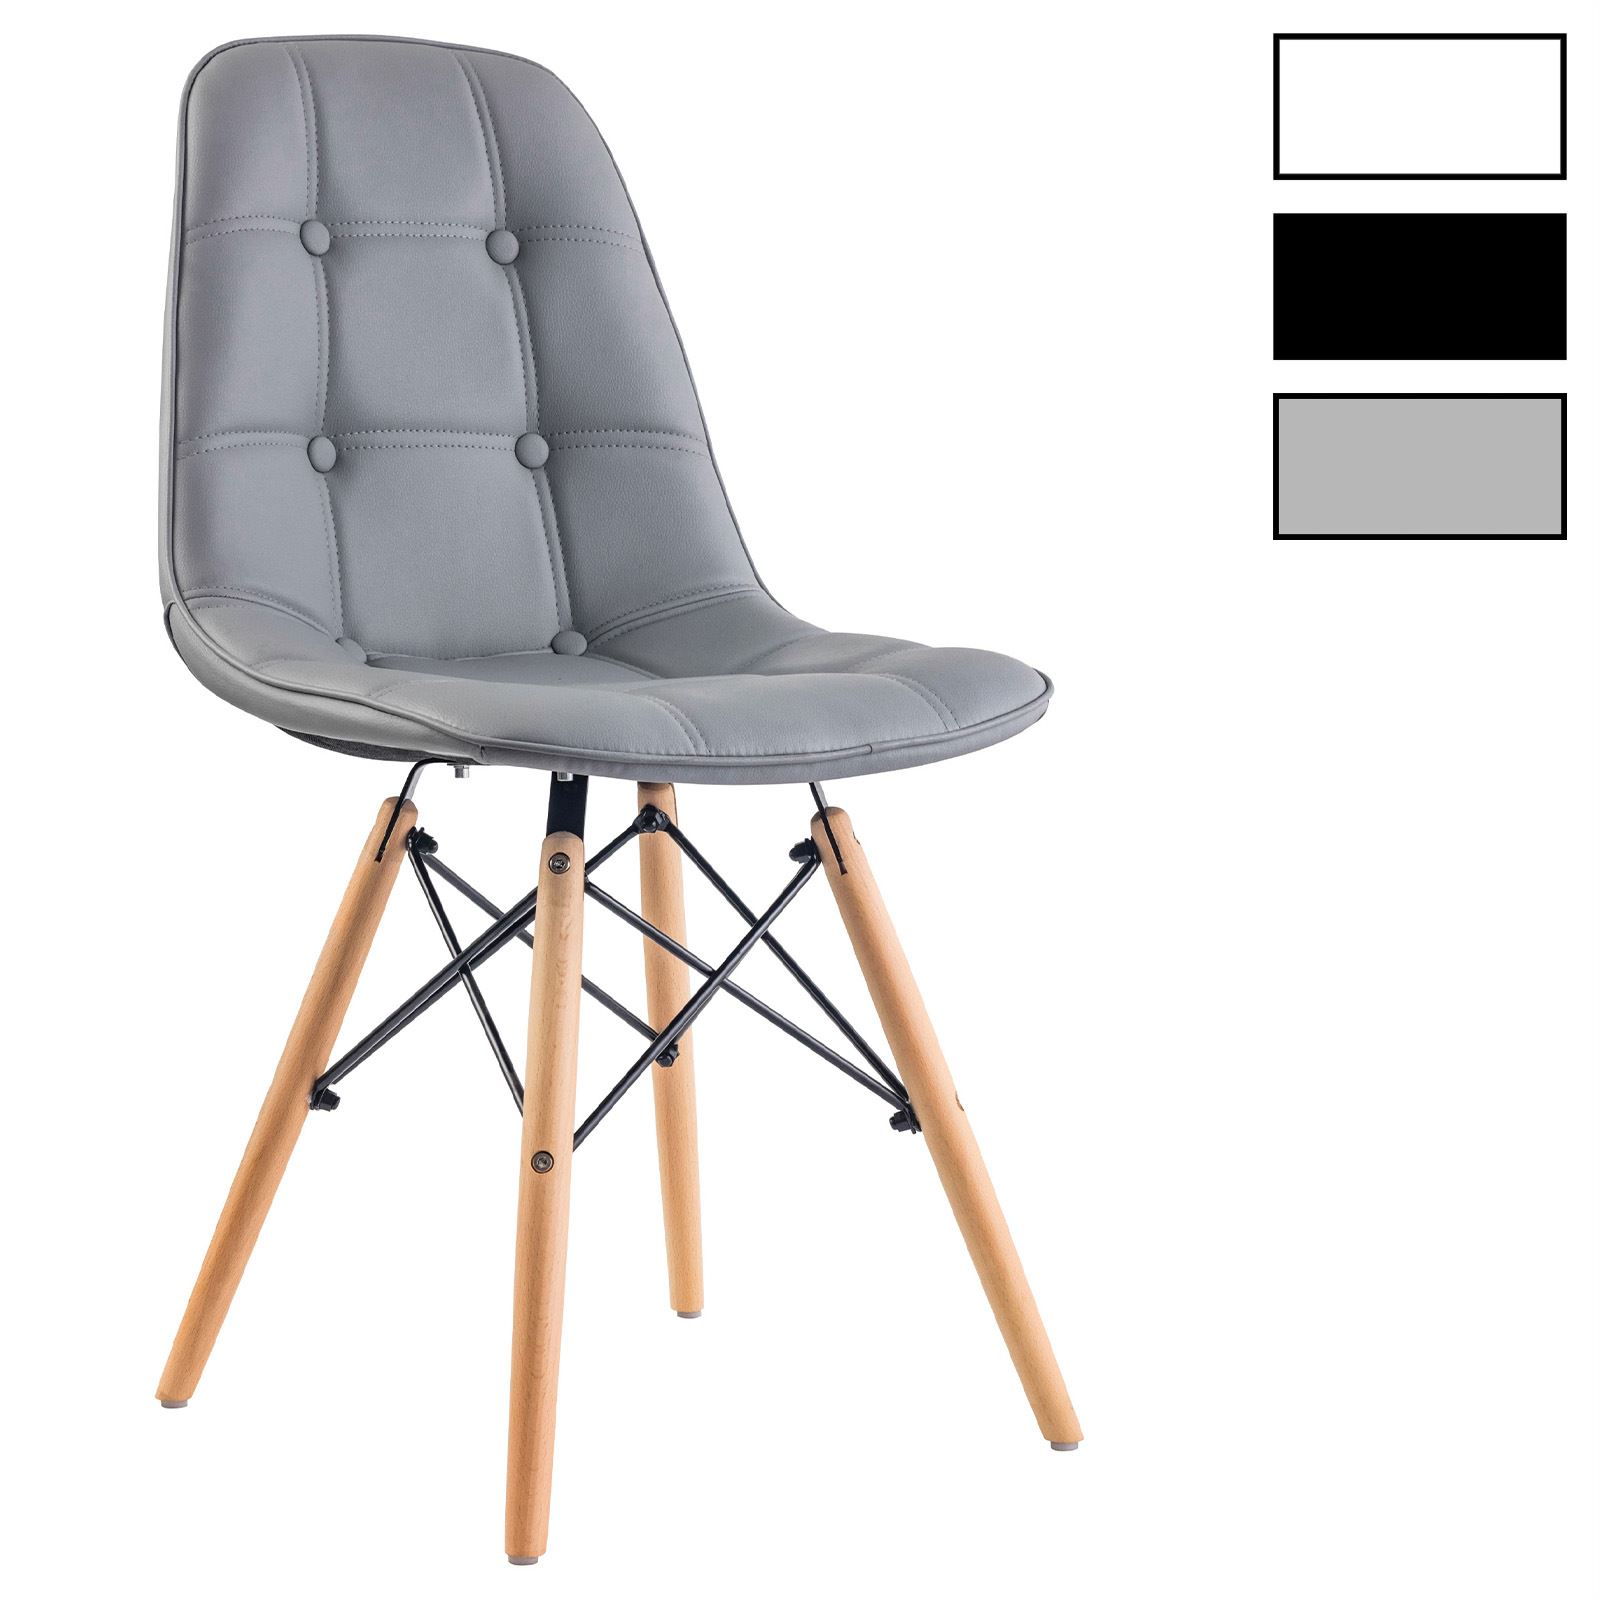 Design Esszimmerstuhl 4er set design esszimmerstuhl cesar farbauswahl mobilia24